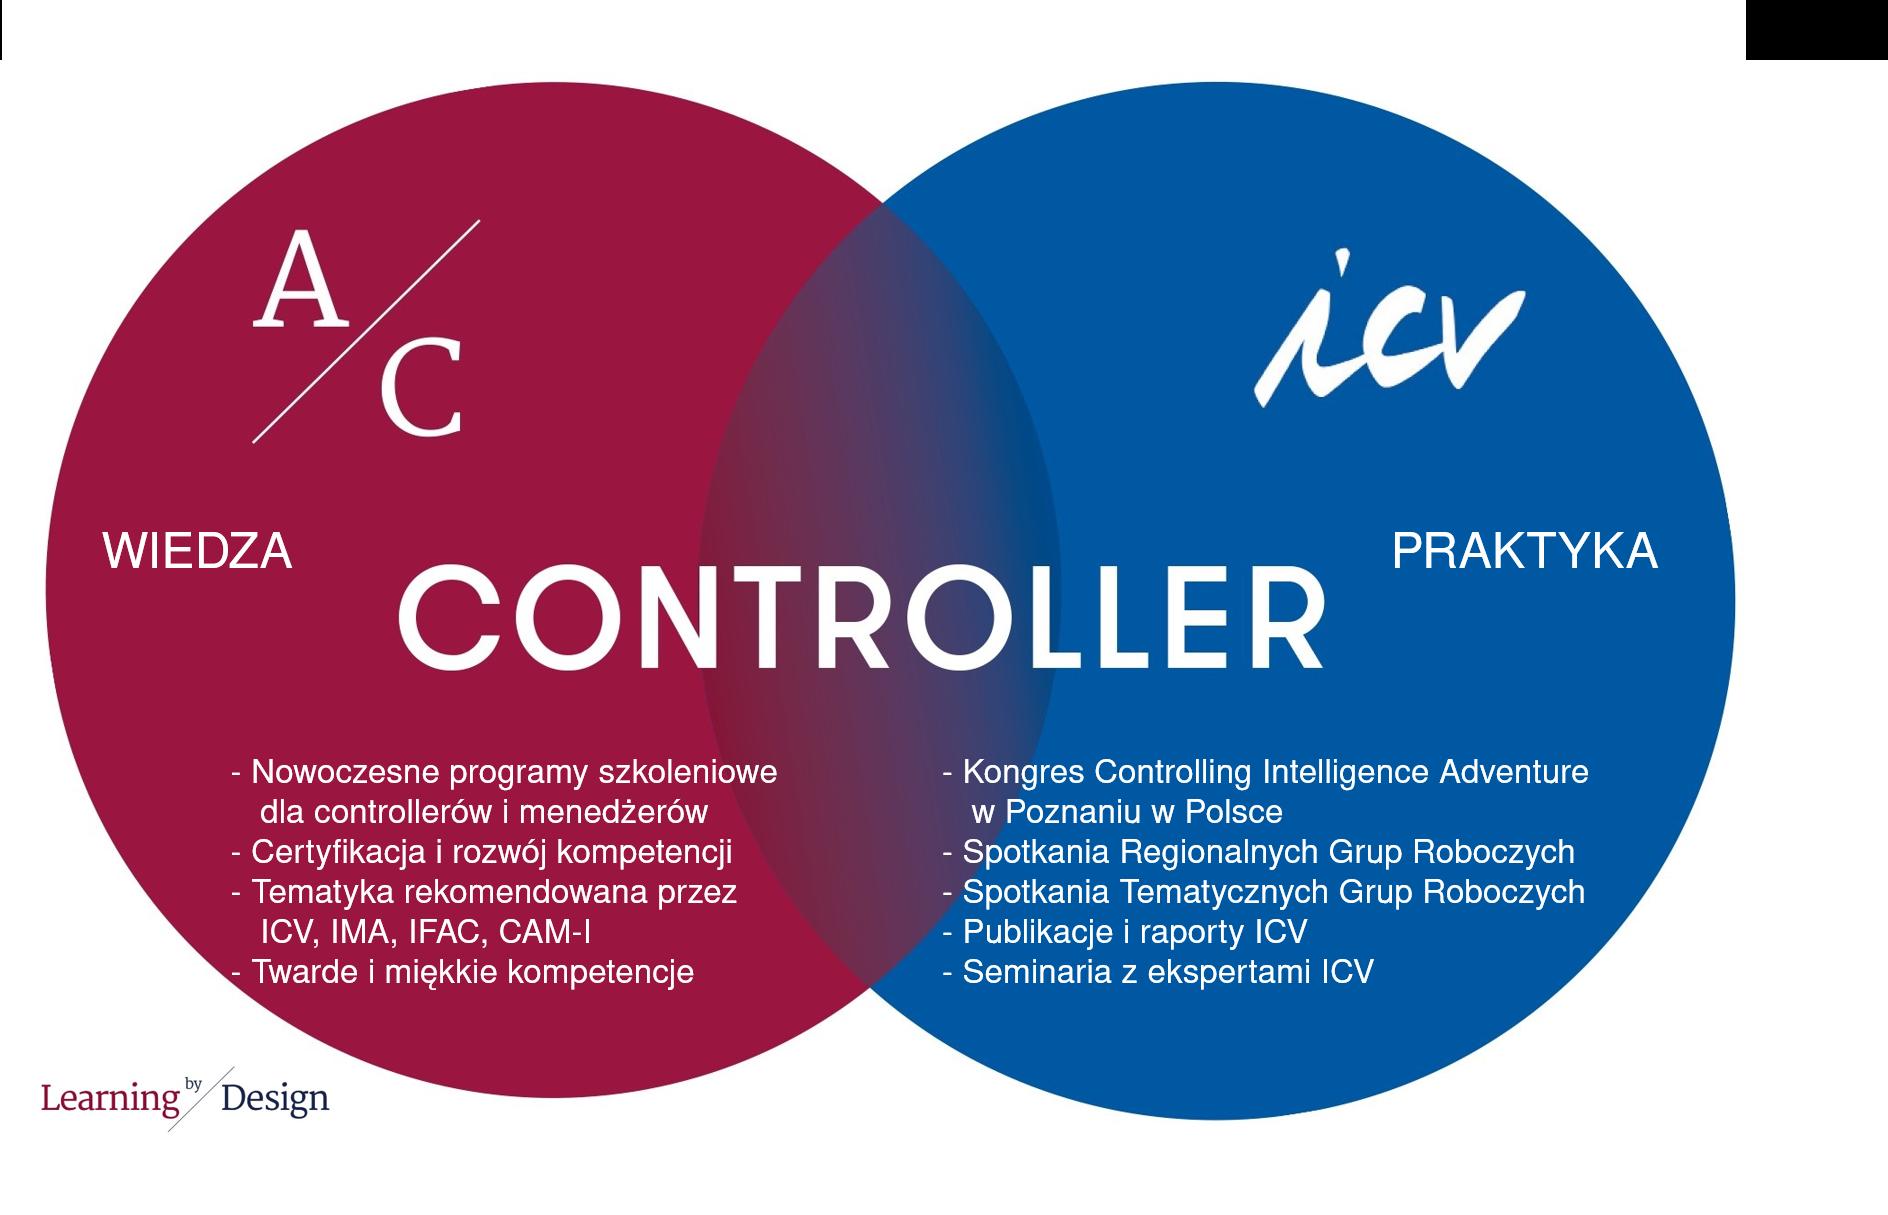 AC i ICV koncepcja